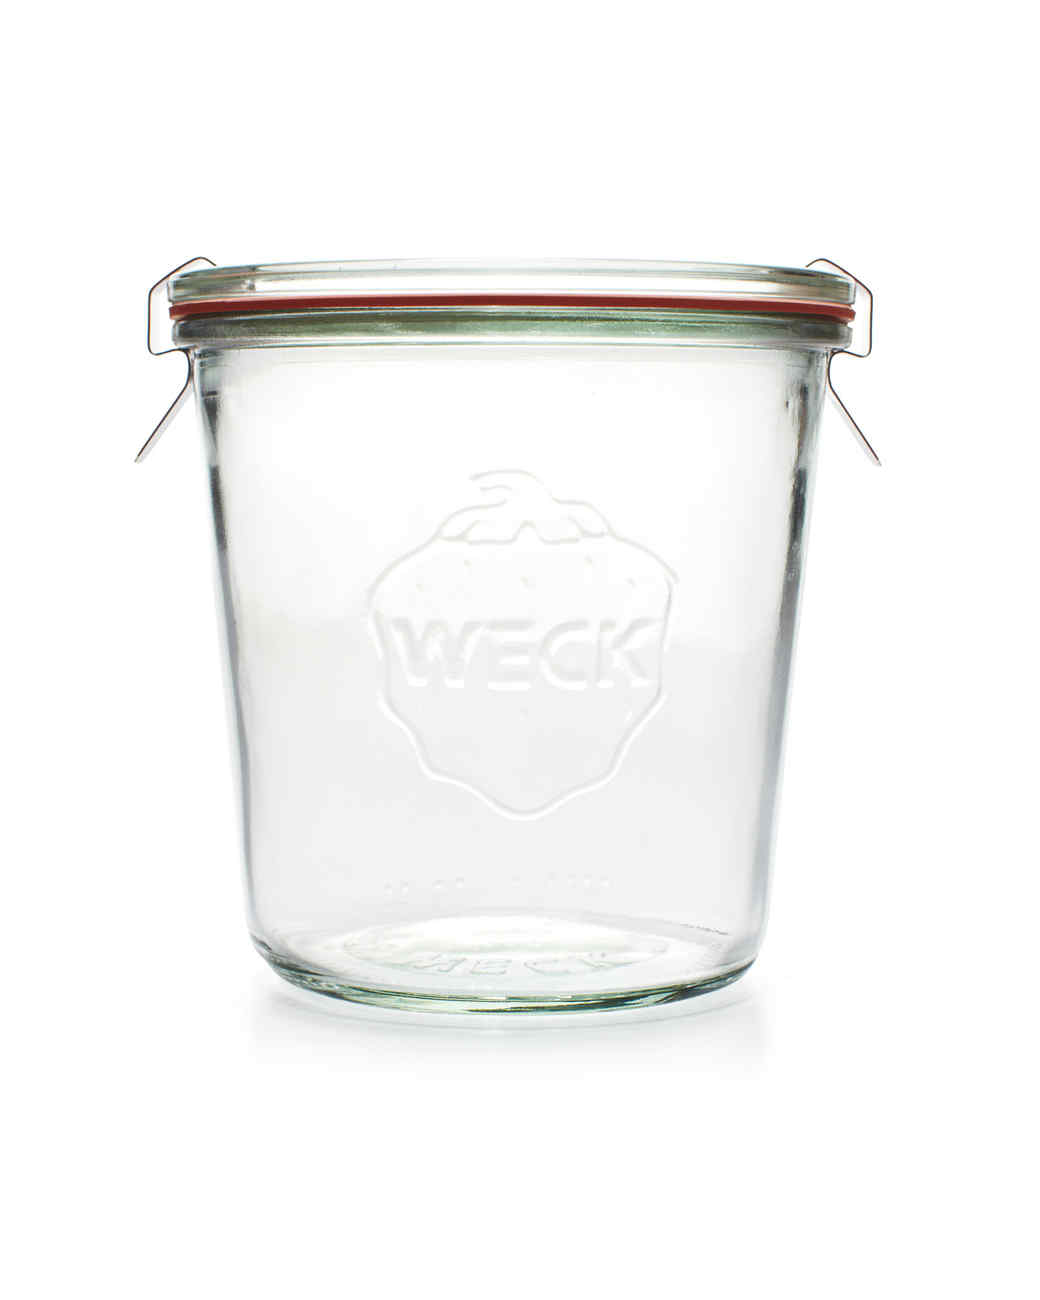 glass-jar-md108096.jpg